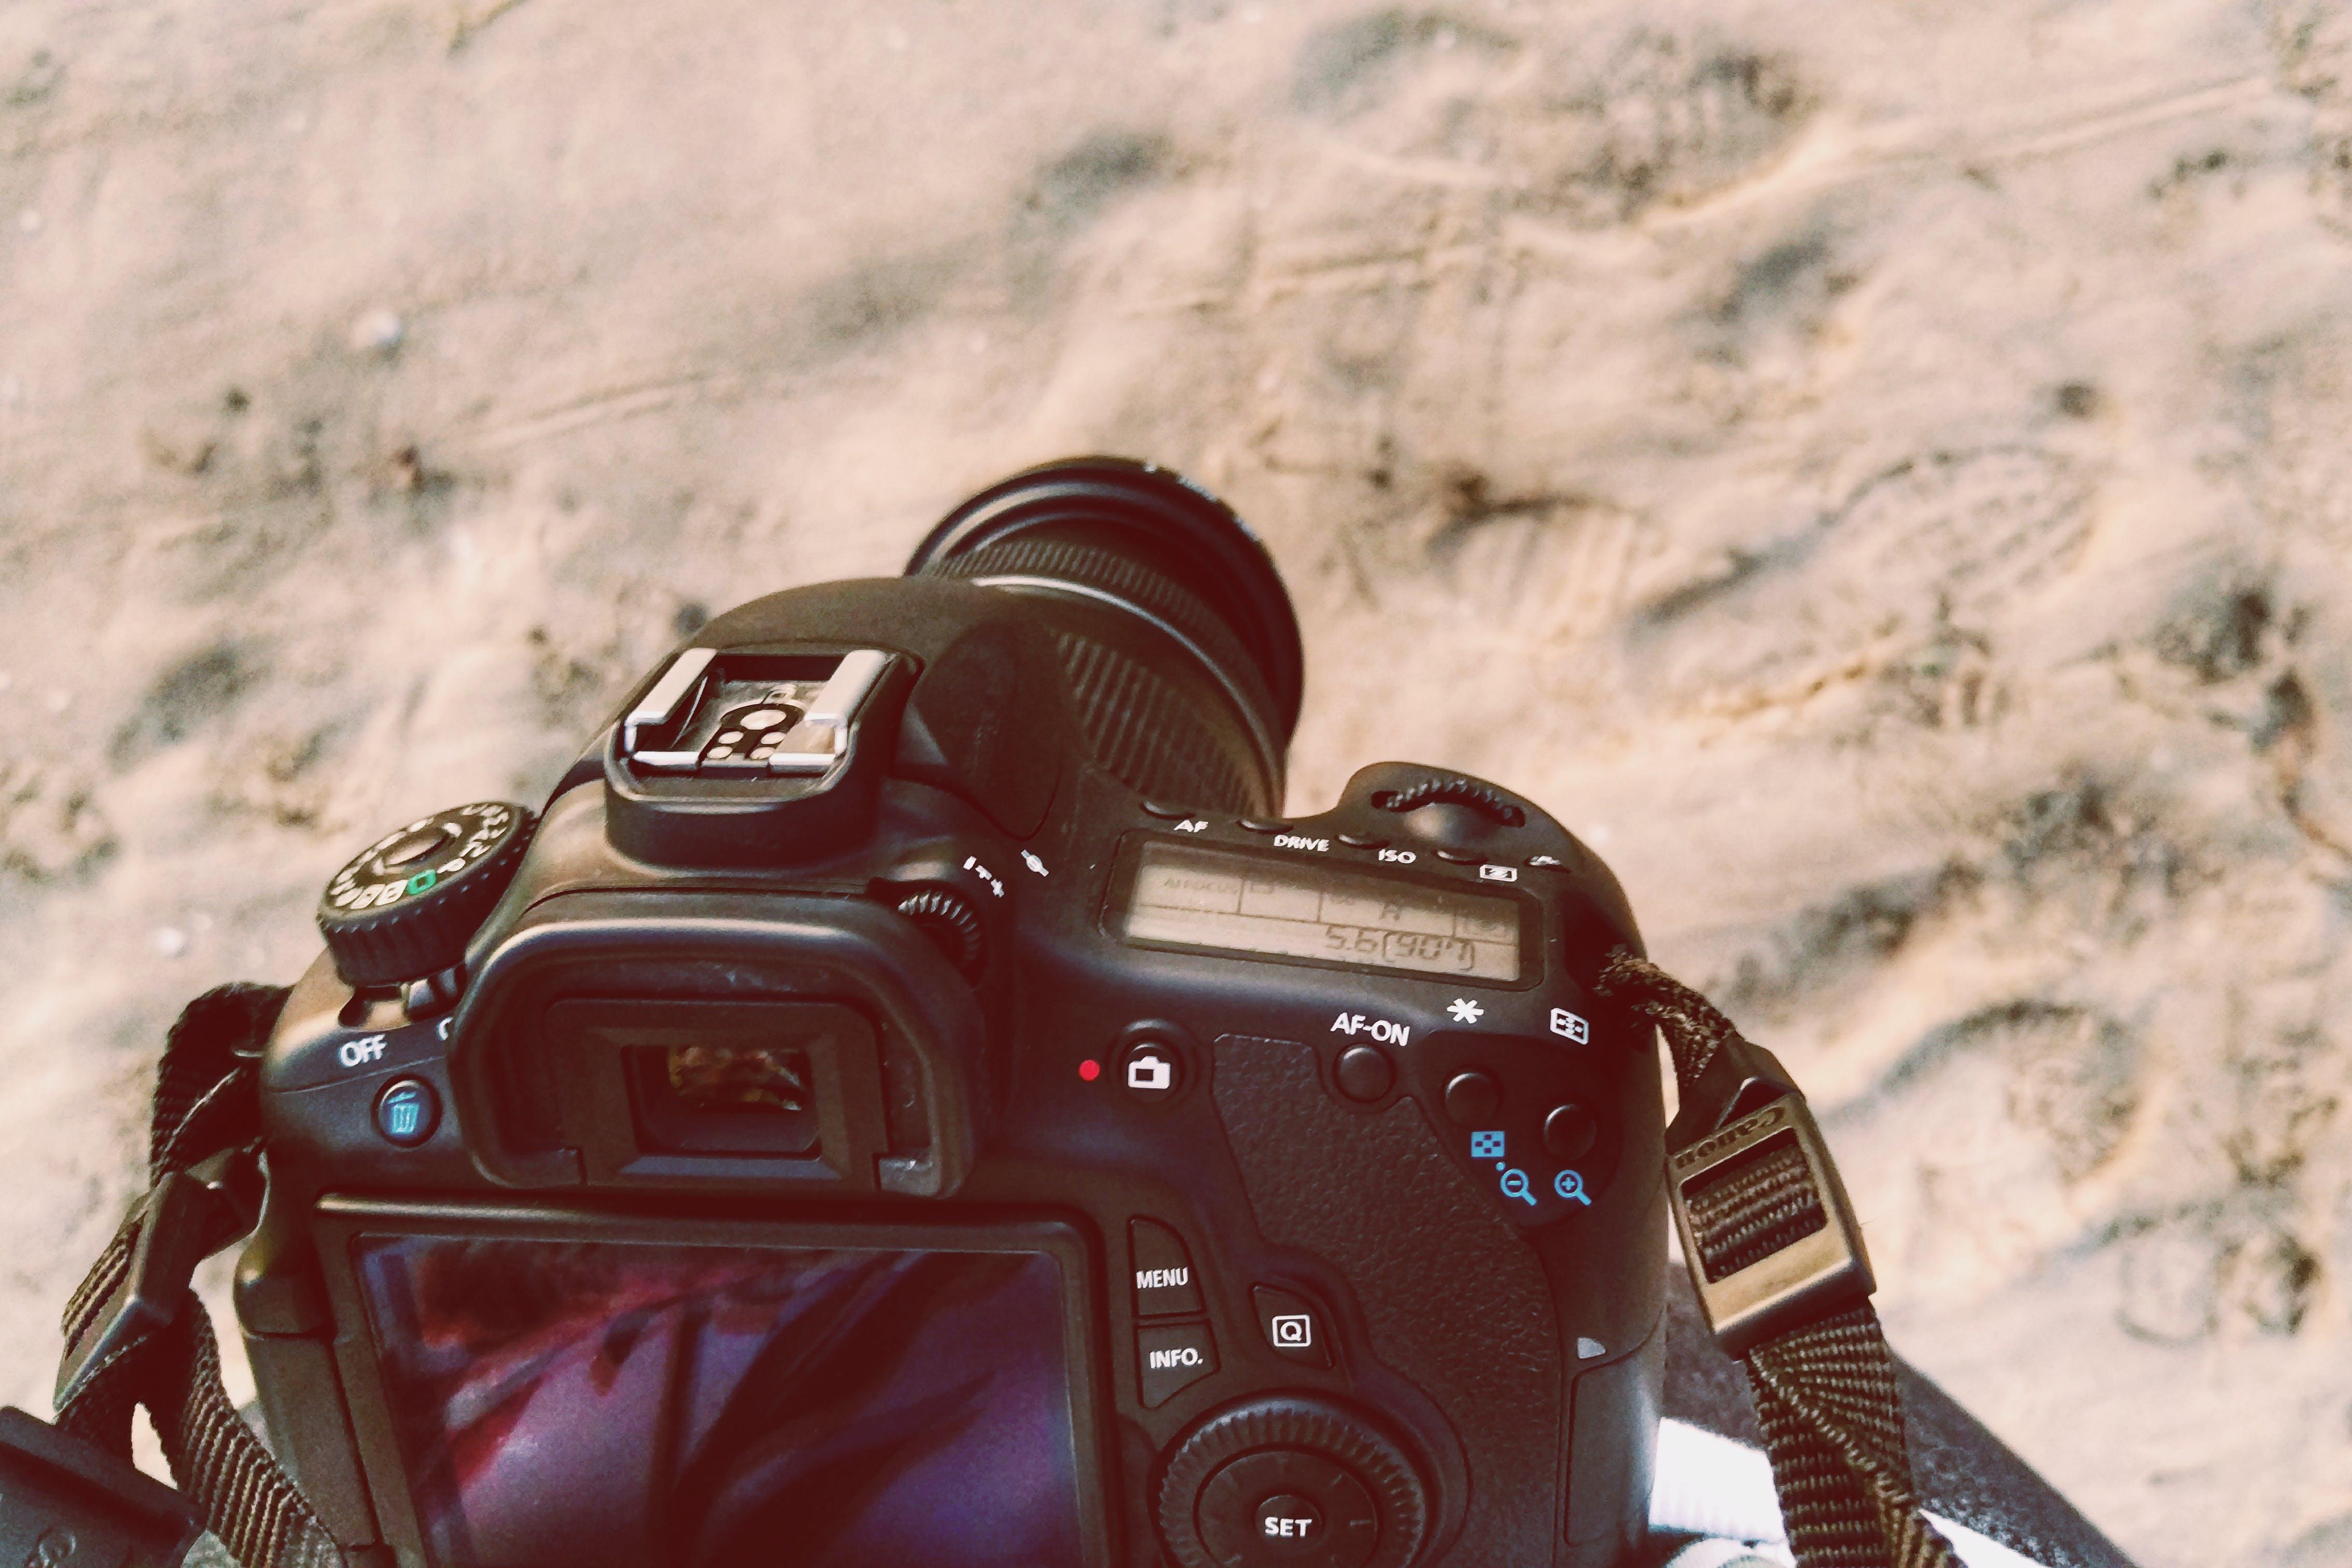 Close-up Photo of Black Dslr Camera